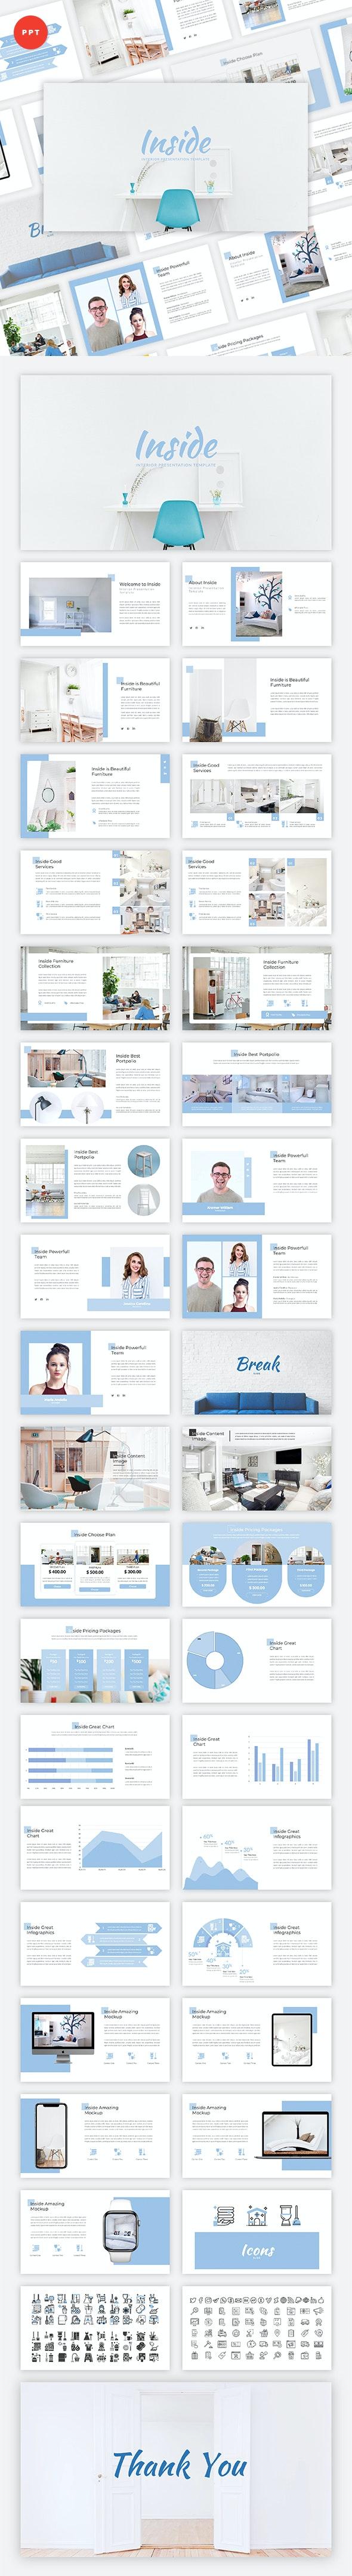 Inside - Interior PowerPoint Template - Creative PowerPoint Templates